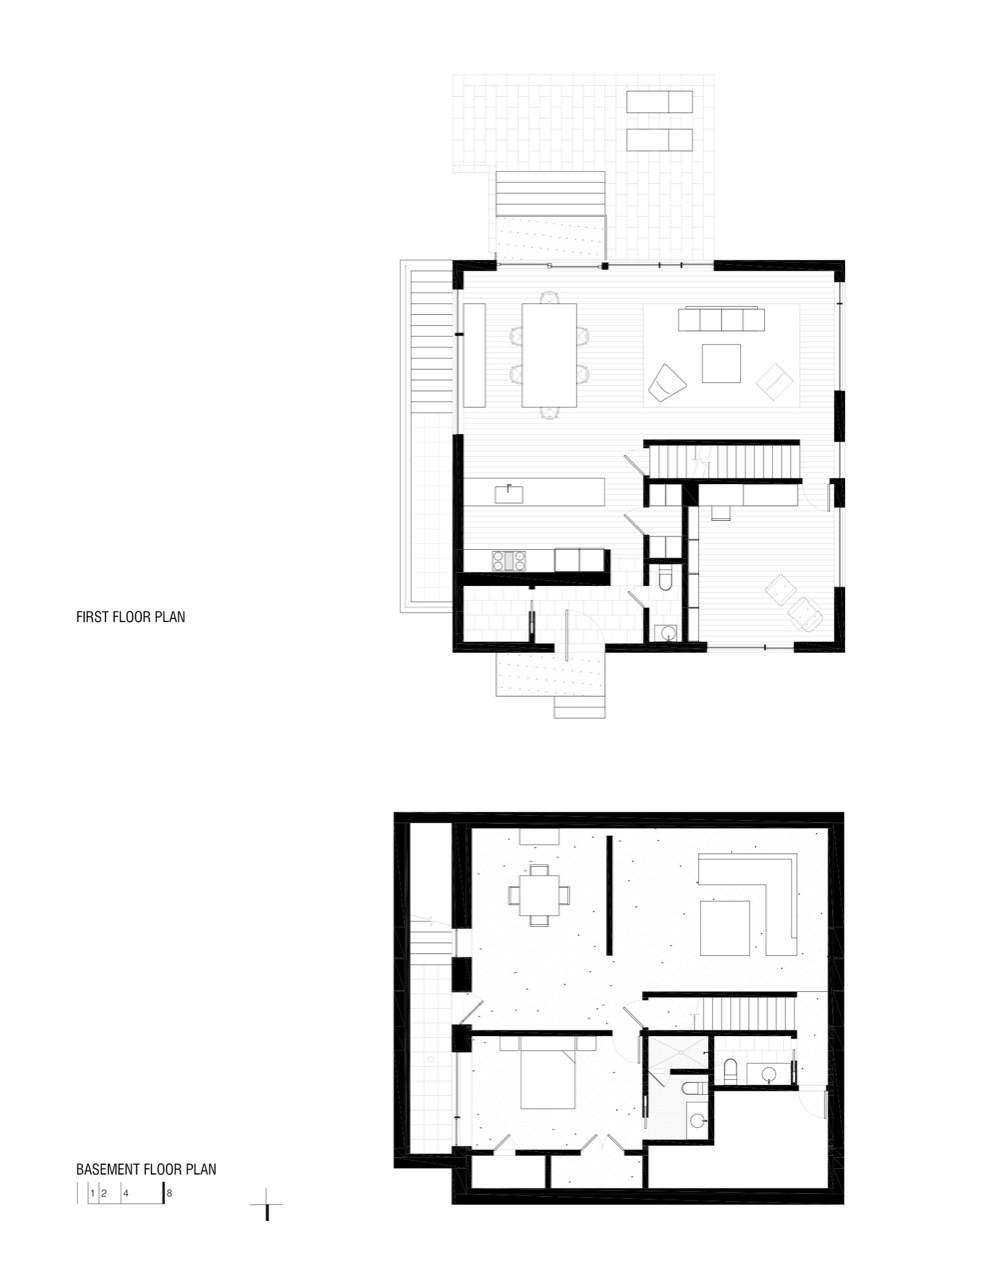 Minimal House Plans gallery of hampden lane house / robert gurney architect - 18